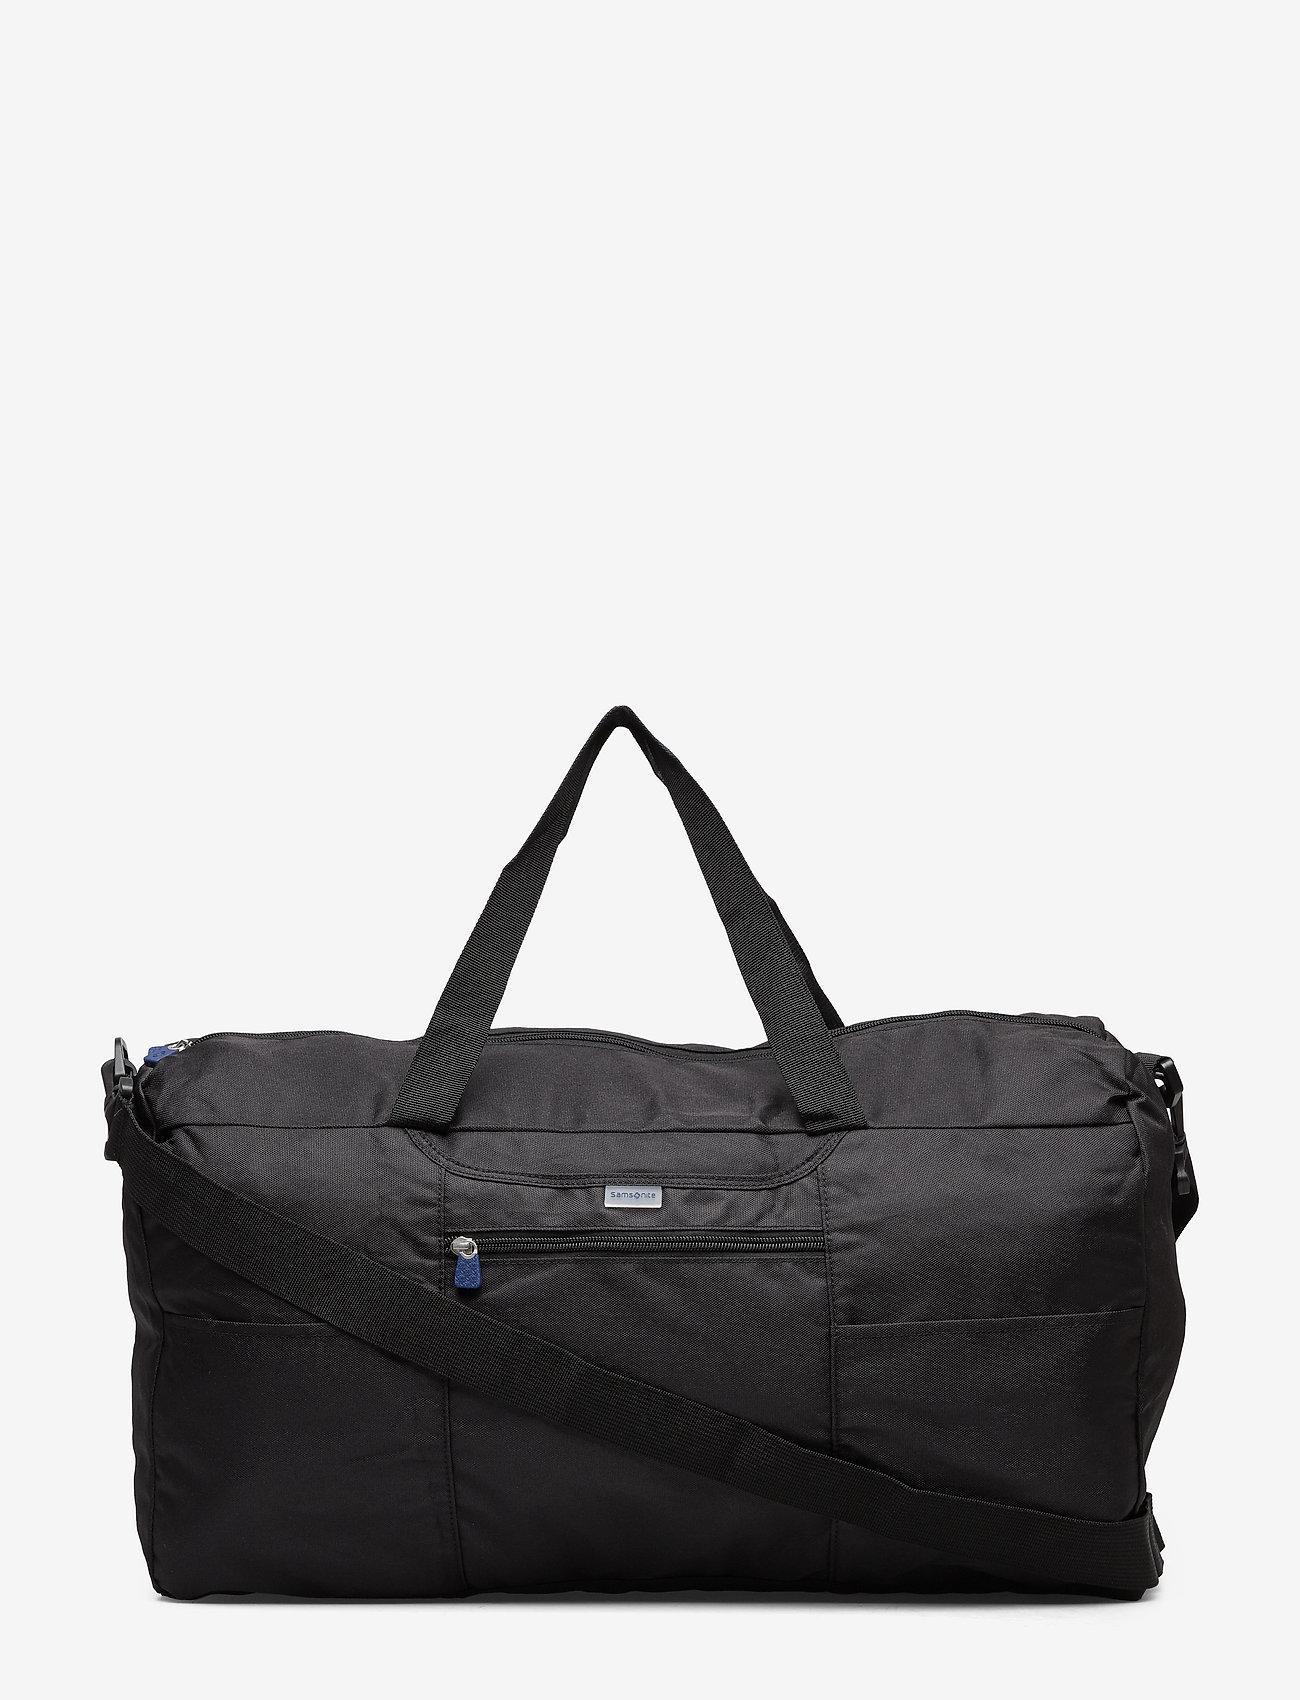 Samsonite - Packing Accessories - Foldable Duffle - black - 1